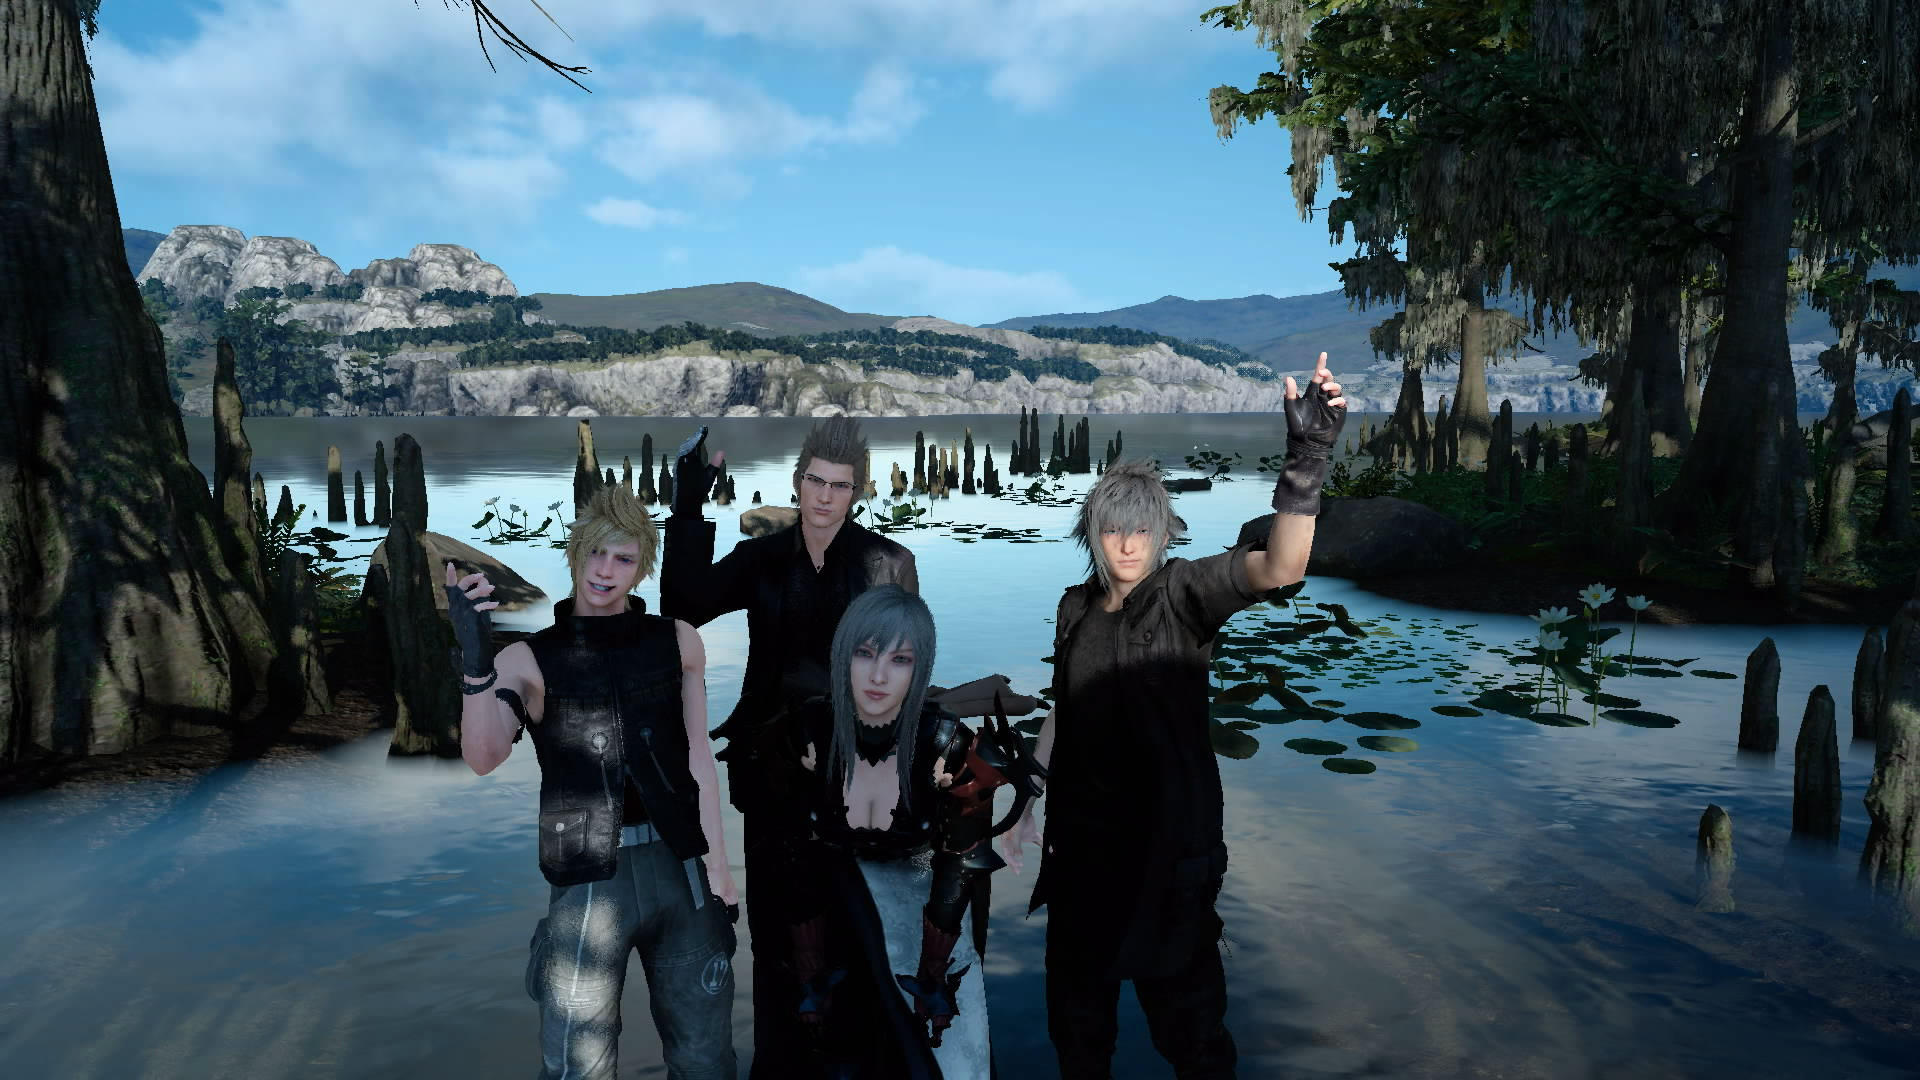 Aranea Highwind Final Fantasy Xv 5k Hd Games 4k: Aranea Highwind Stuff T Final Fantasy Final Fantasy Xv